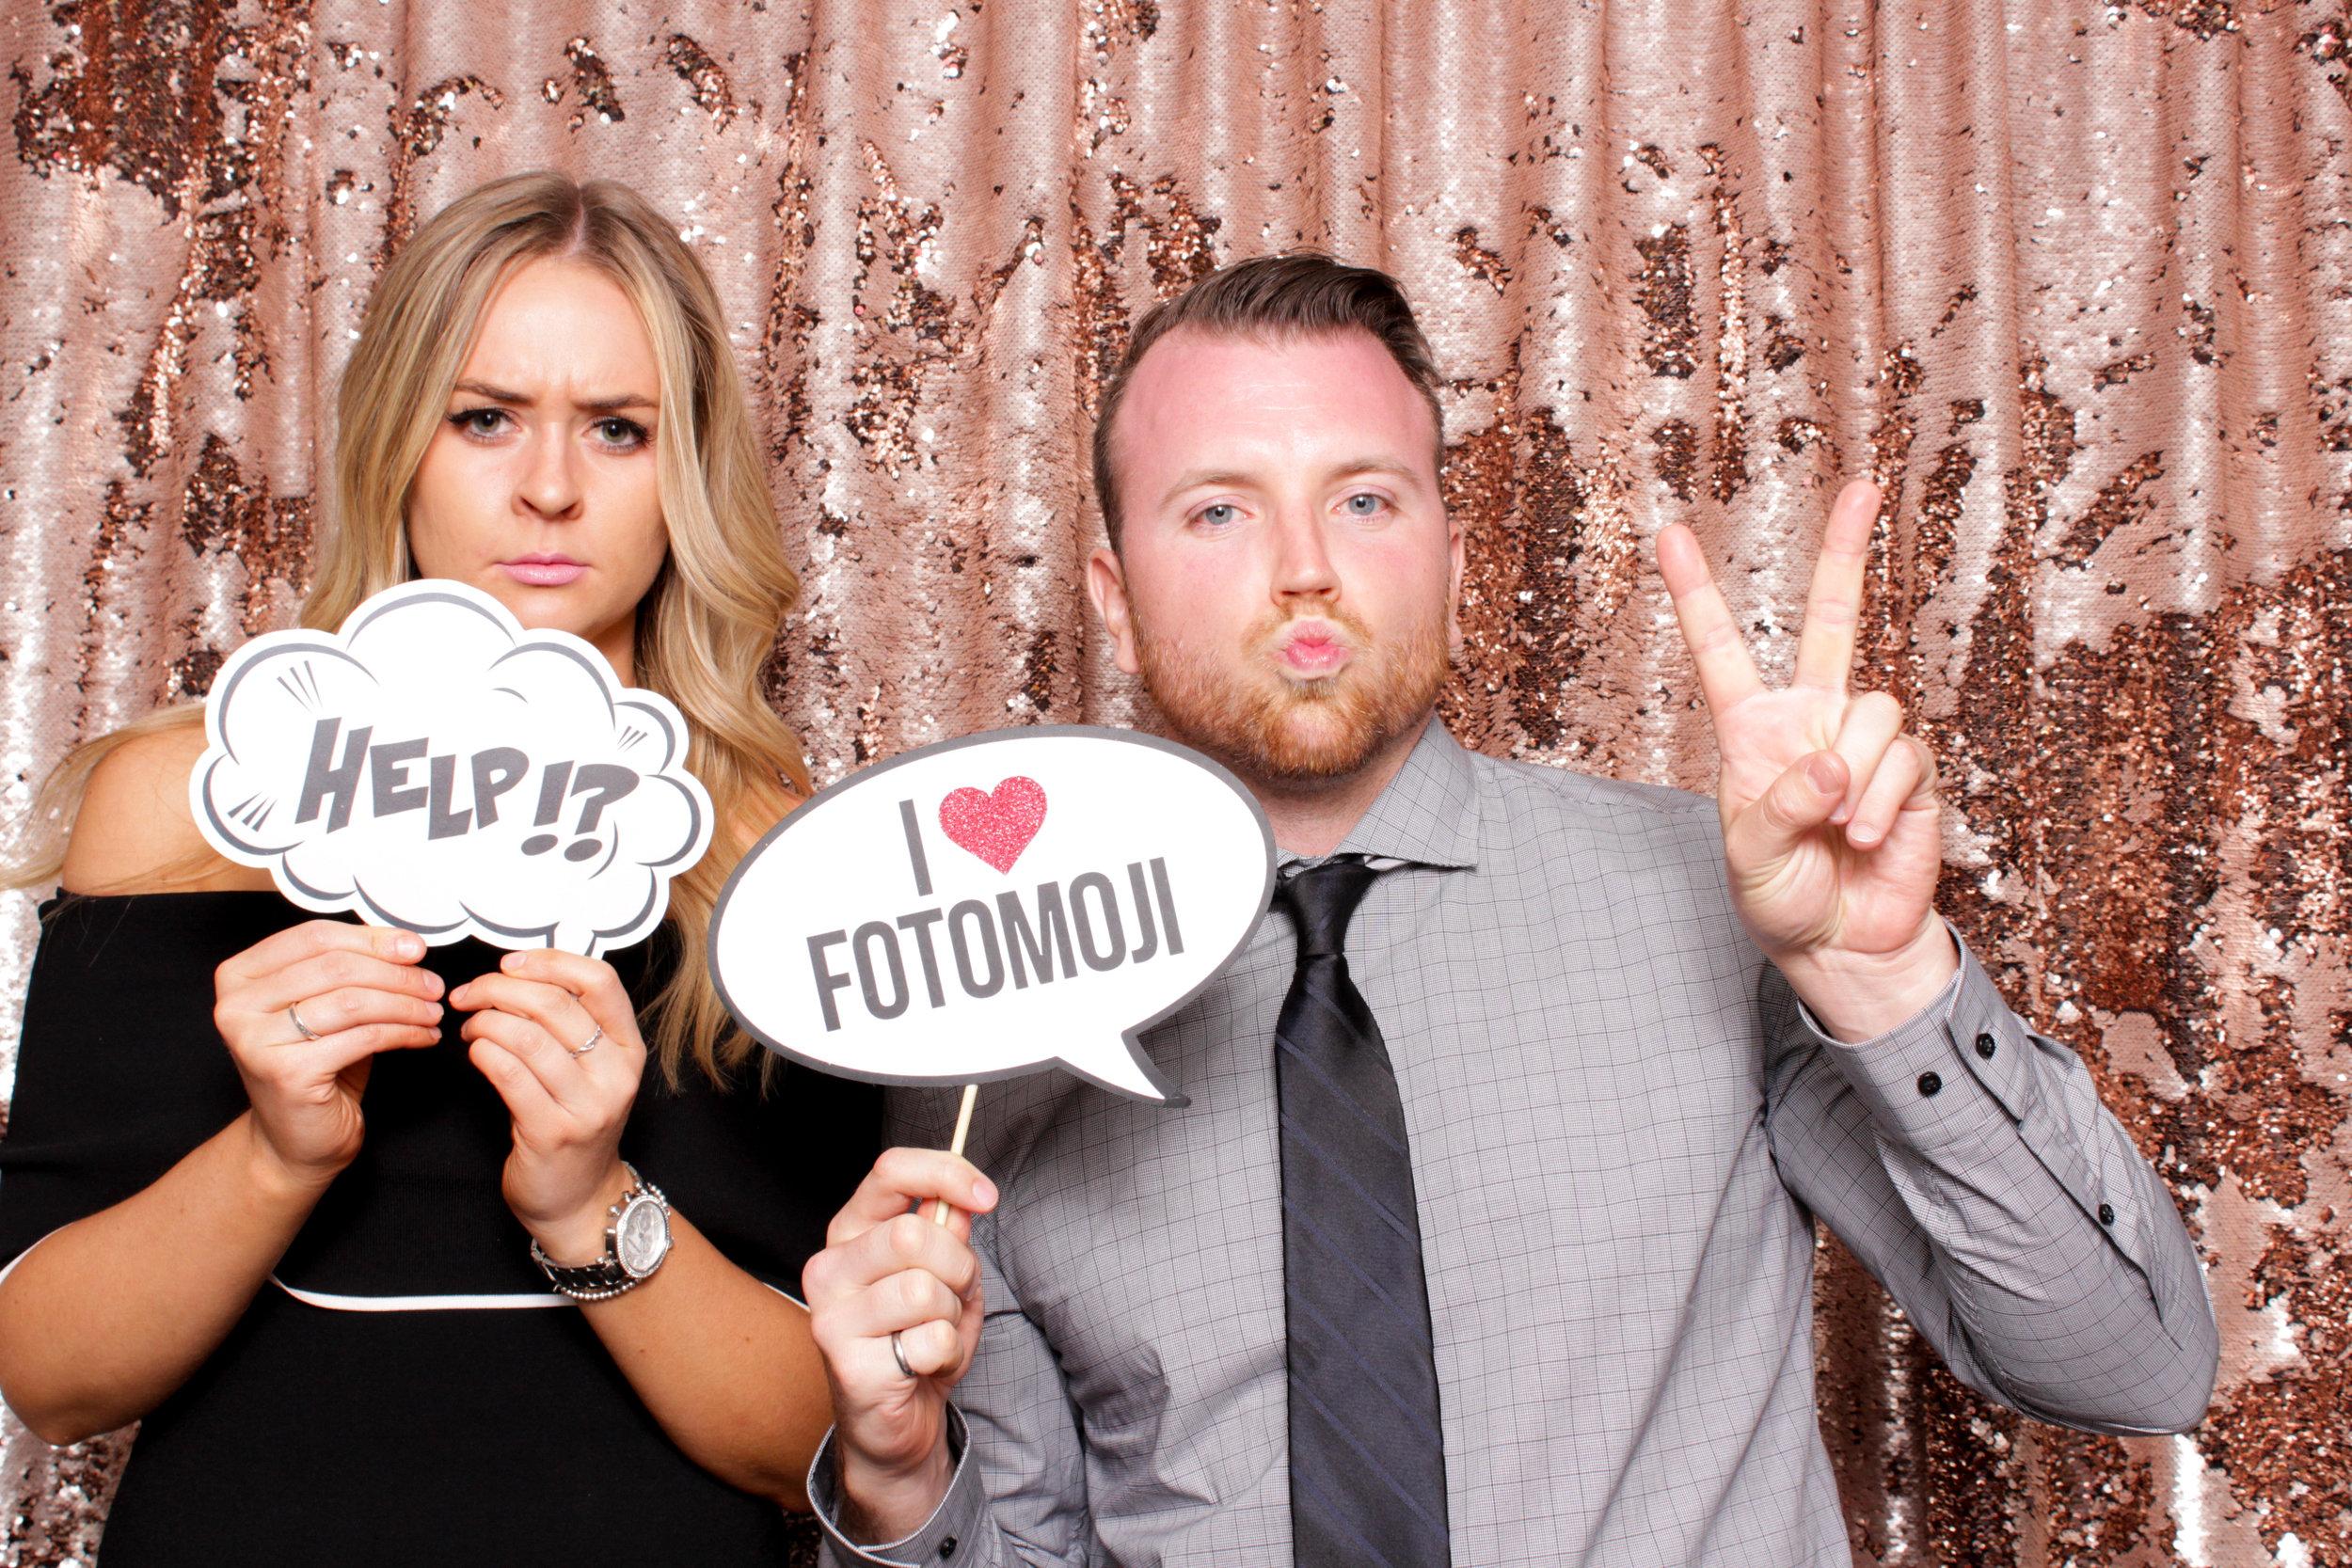 FOTOMOJI_Calgary_Wedding_Photo_Booth_Rental-140.jpg